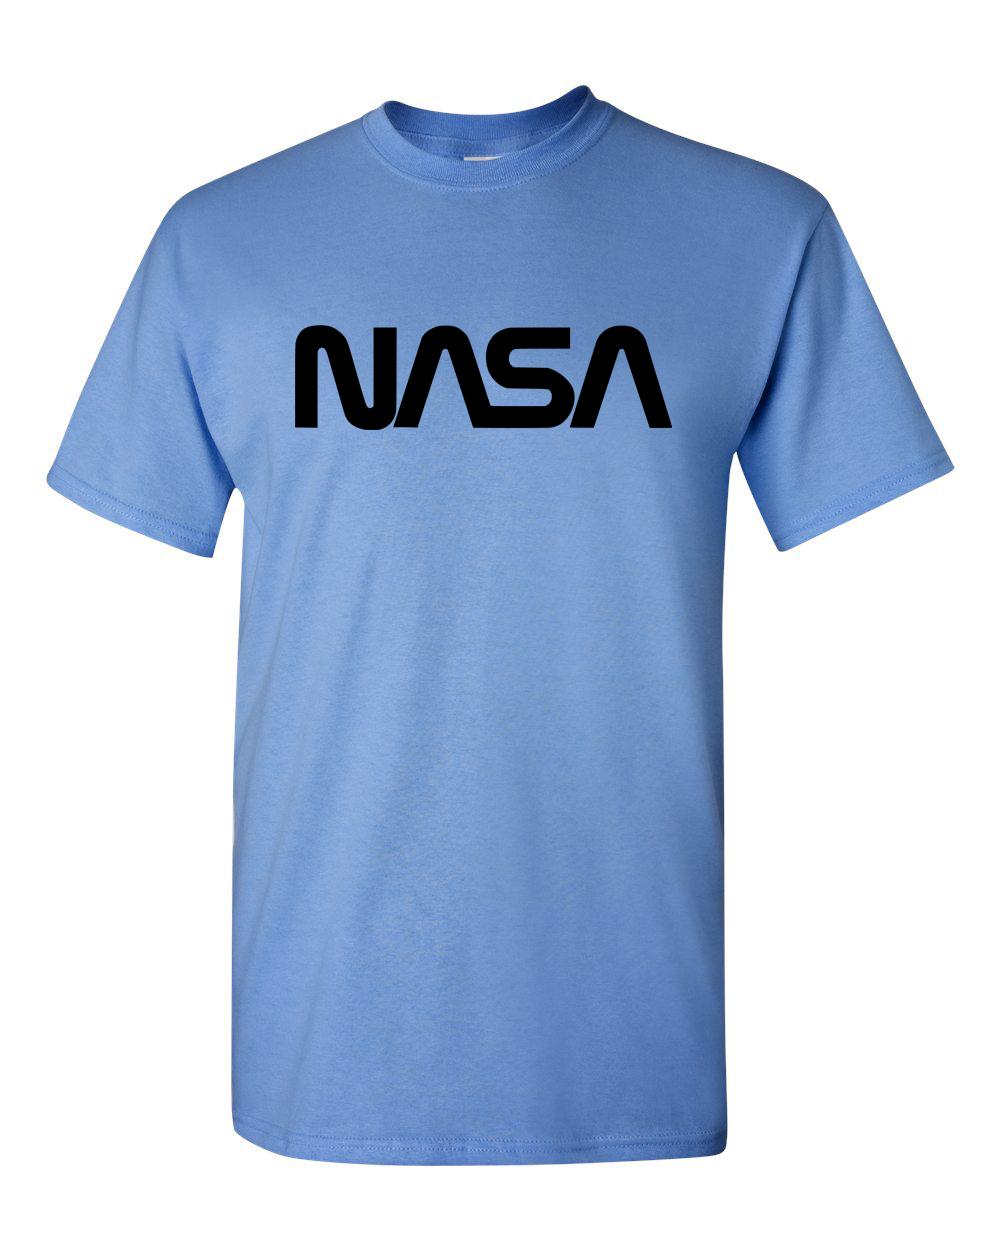 nasa adult clothing - photo #32